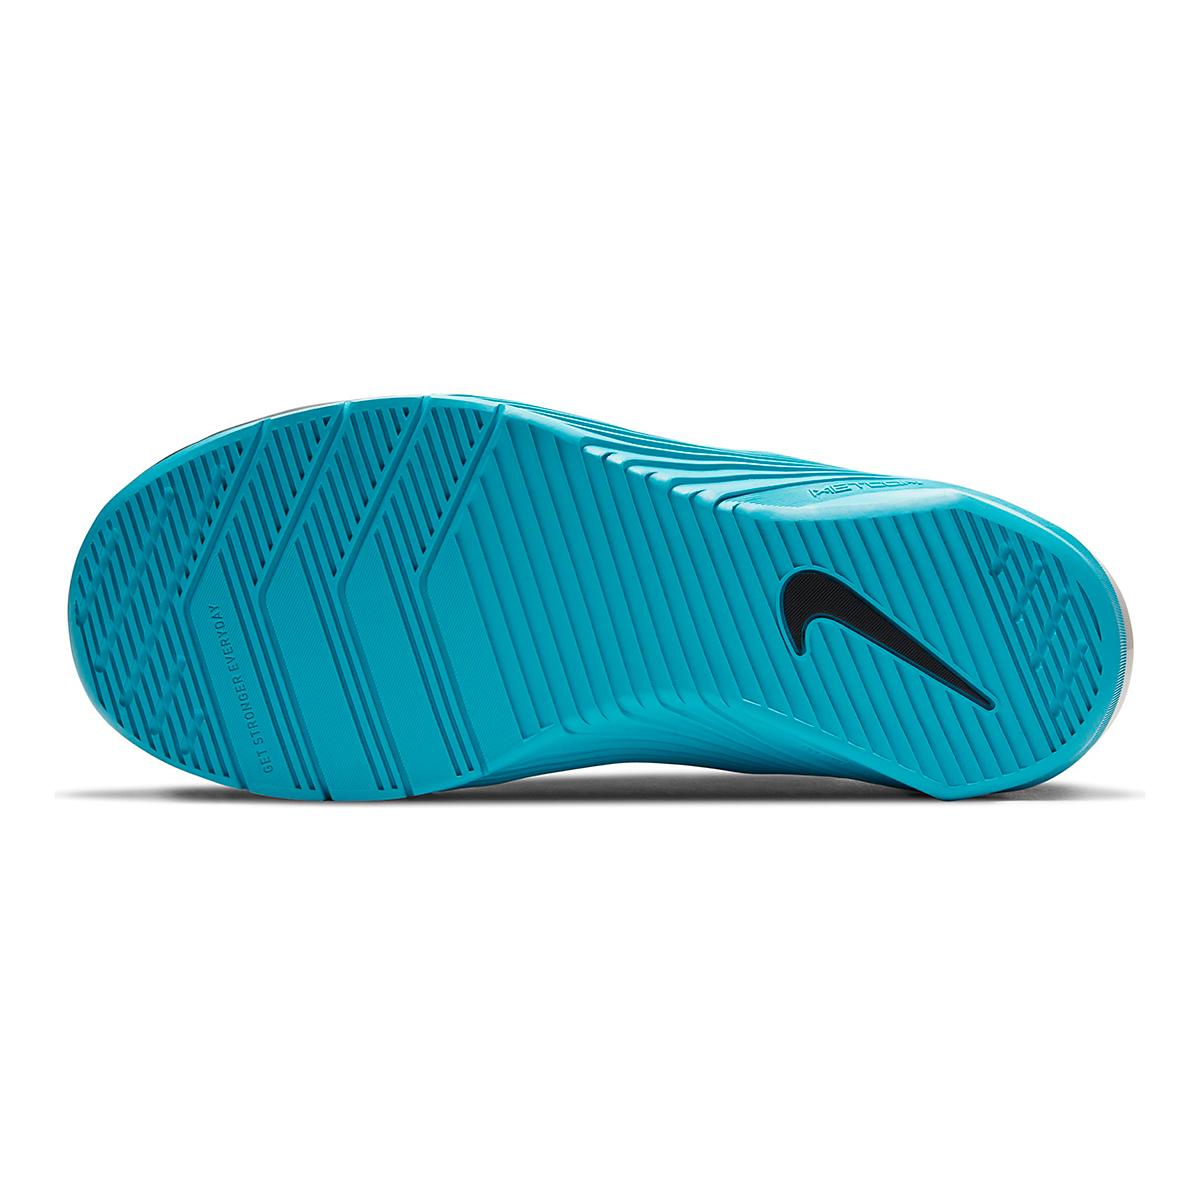 Men's Nike Metcon 6 Training Shoes - Color: Black/University Red/Light Blue Fury - Size: 5 - Width: Regular, Black/University Red/Light Blue Fury, large, image 6